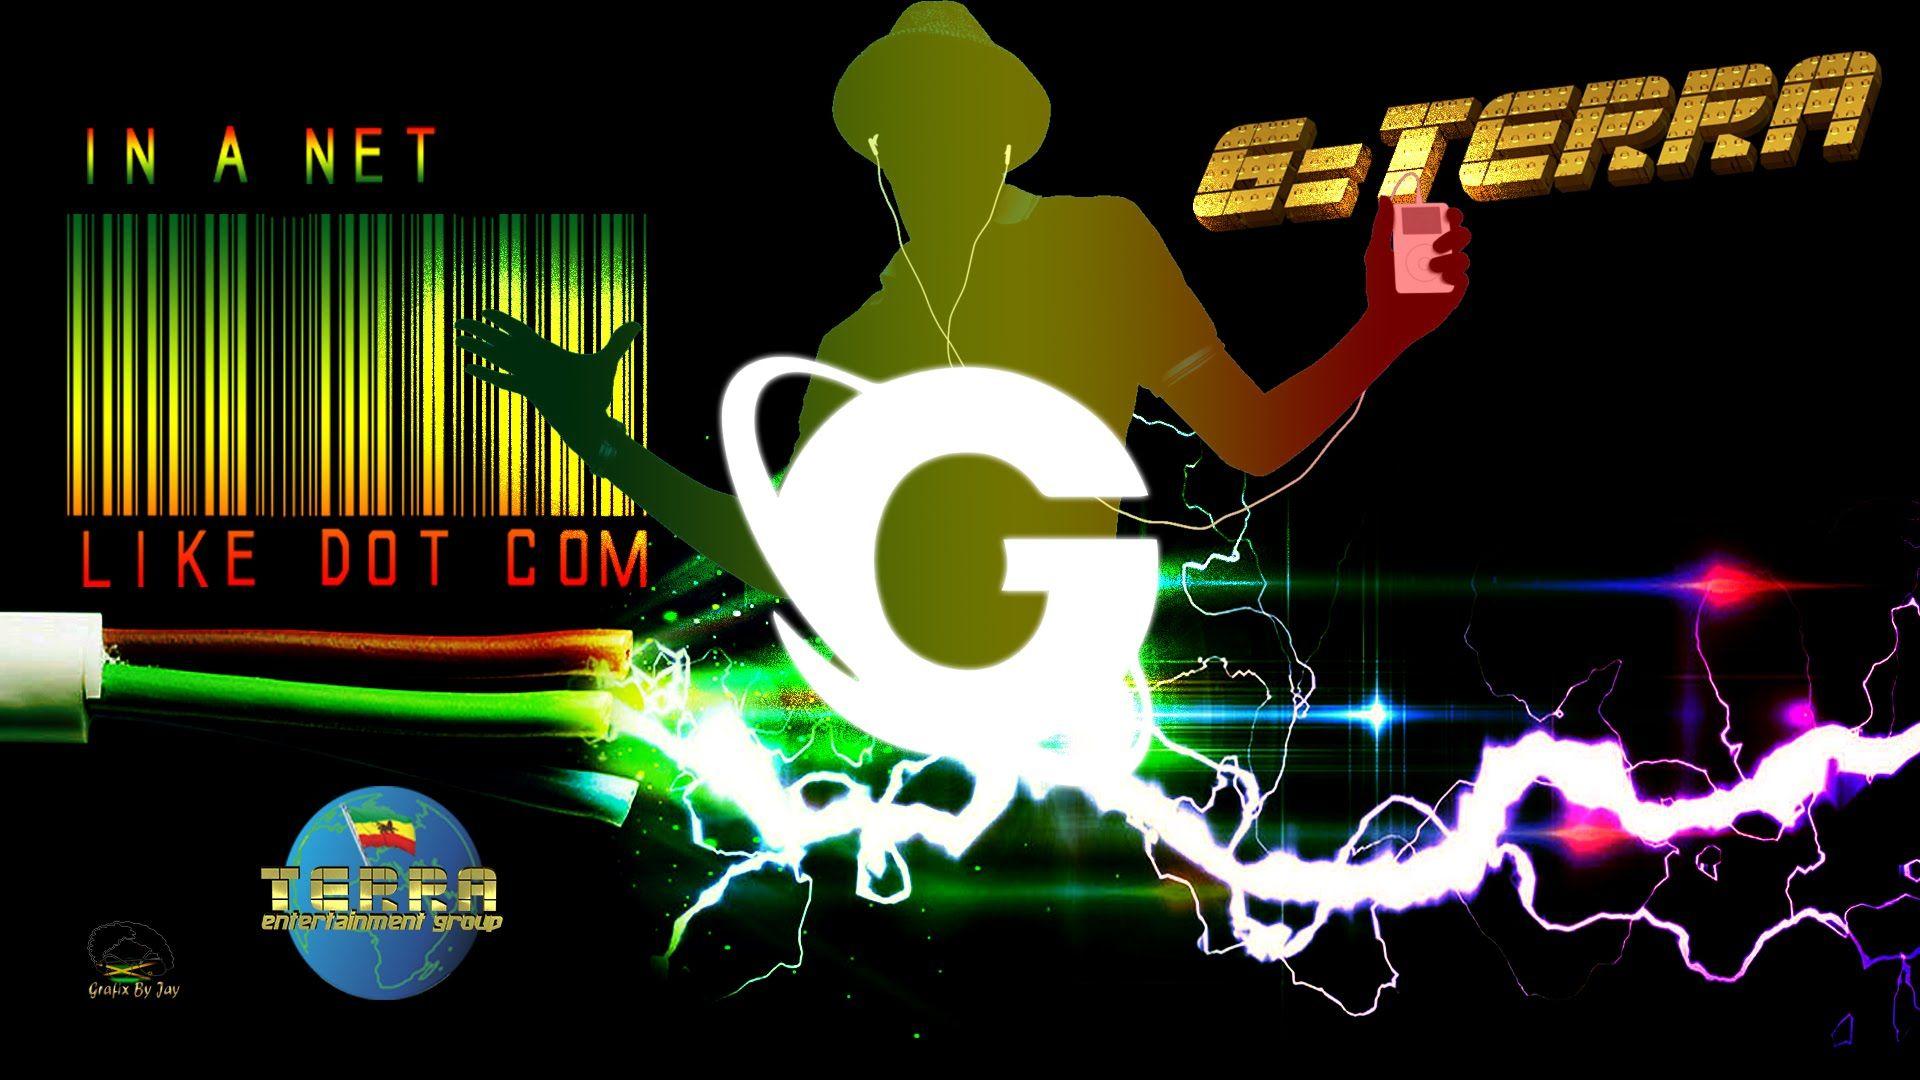 "G-Terra ""In a Net Like Dot Com"" [Di MATIQ Riddim] Dancehall 2016 | Hip hop  music, Dots, Neon signs"